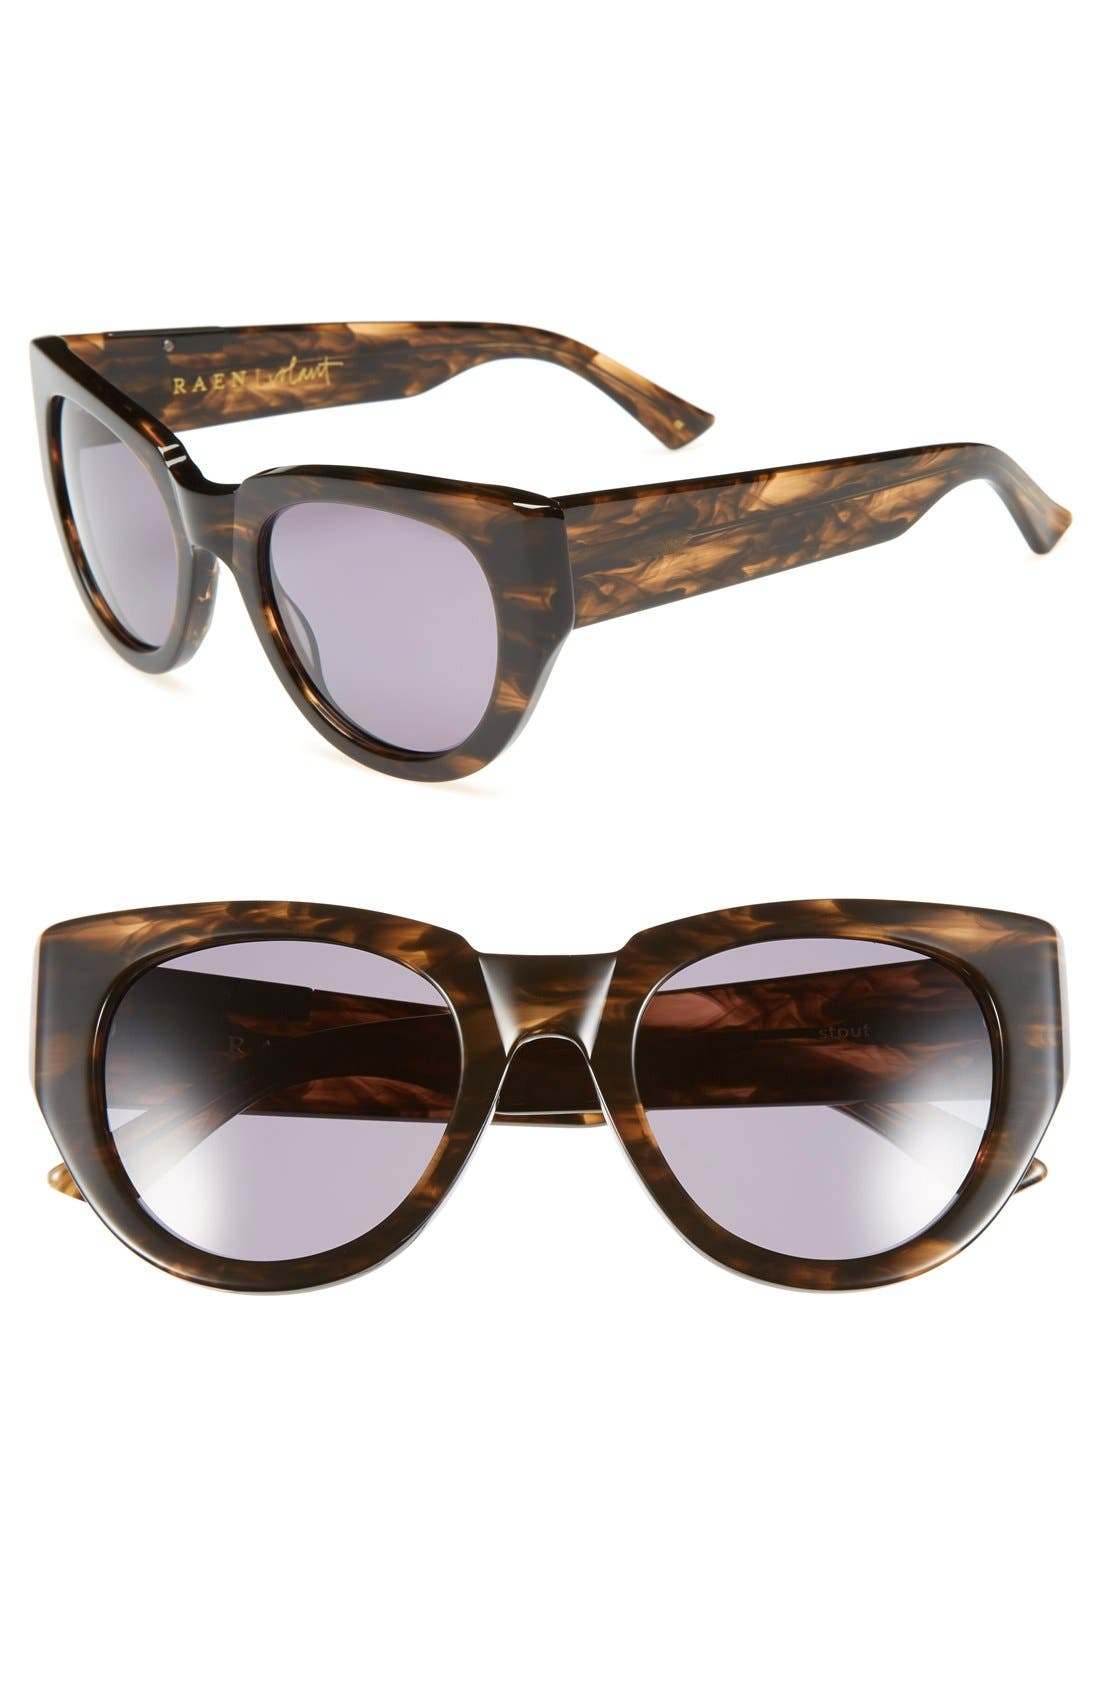 Alternate Image 1 Selected - RAEN 'Volant' 52mm Sunglasses